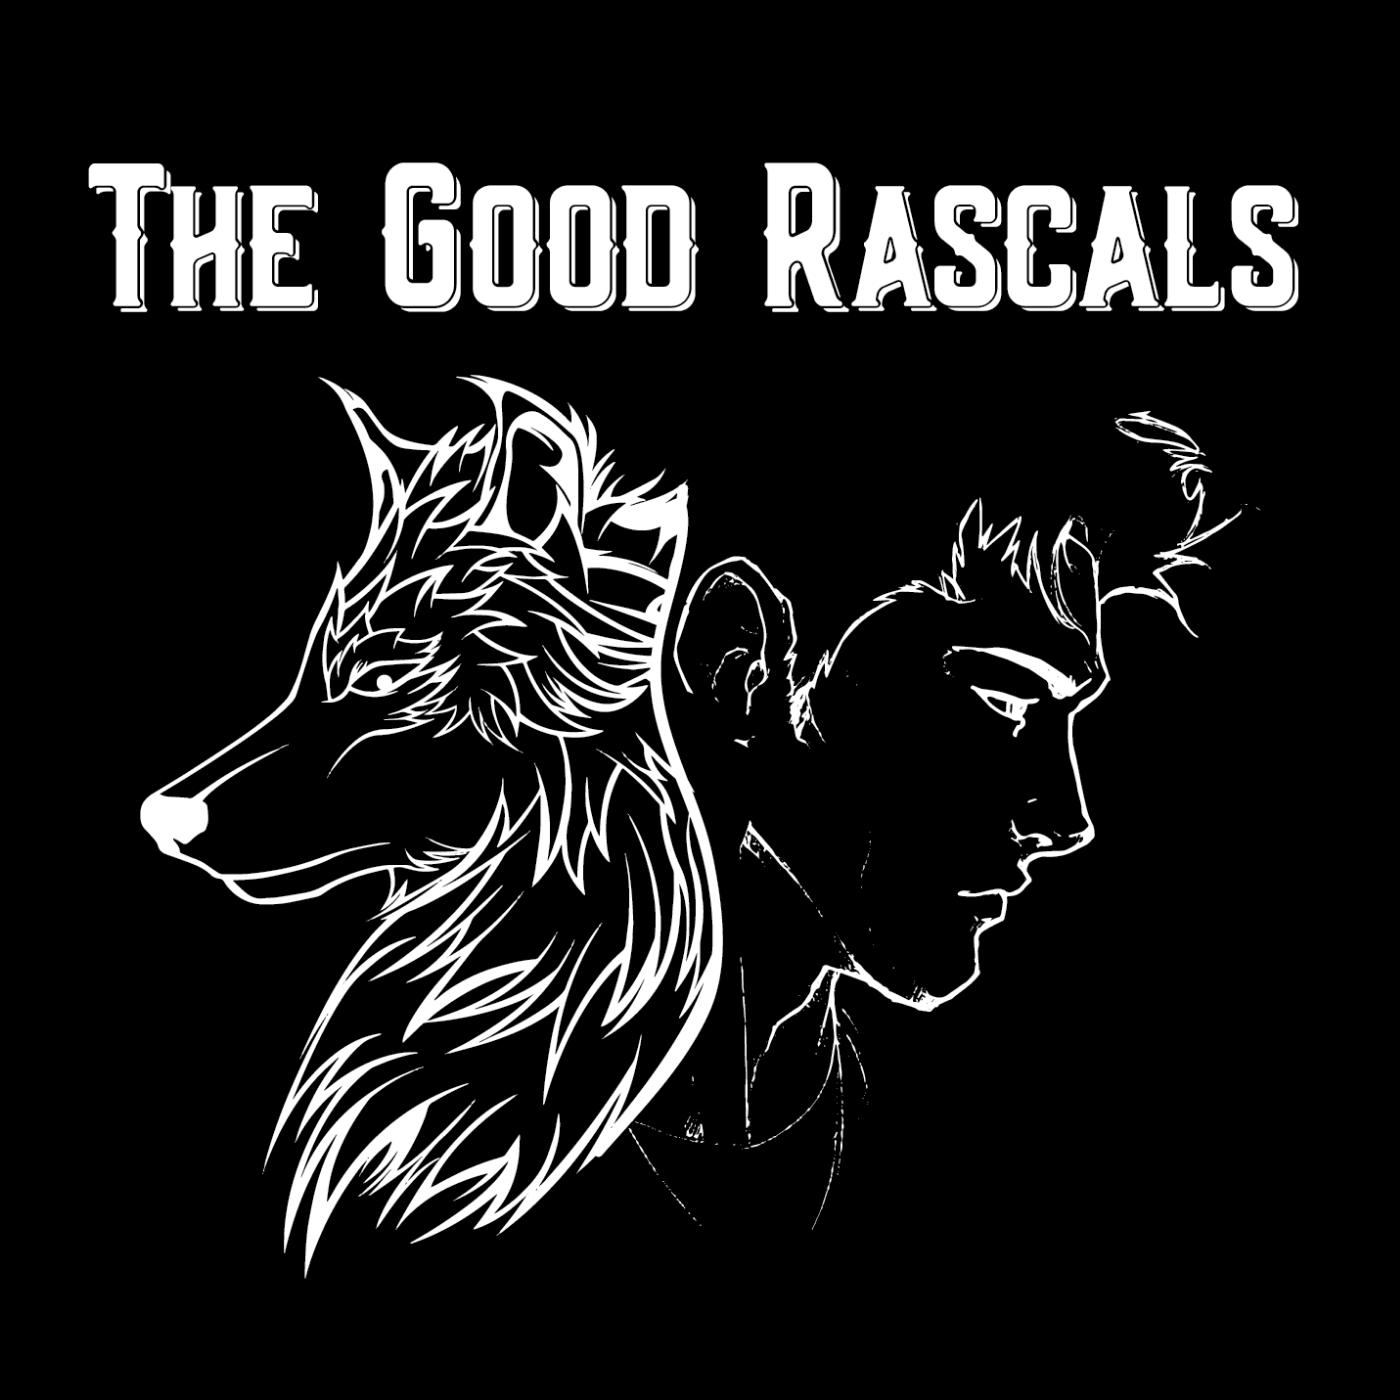 The Good Rascals